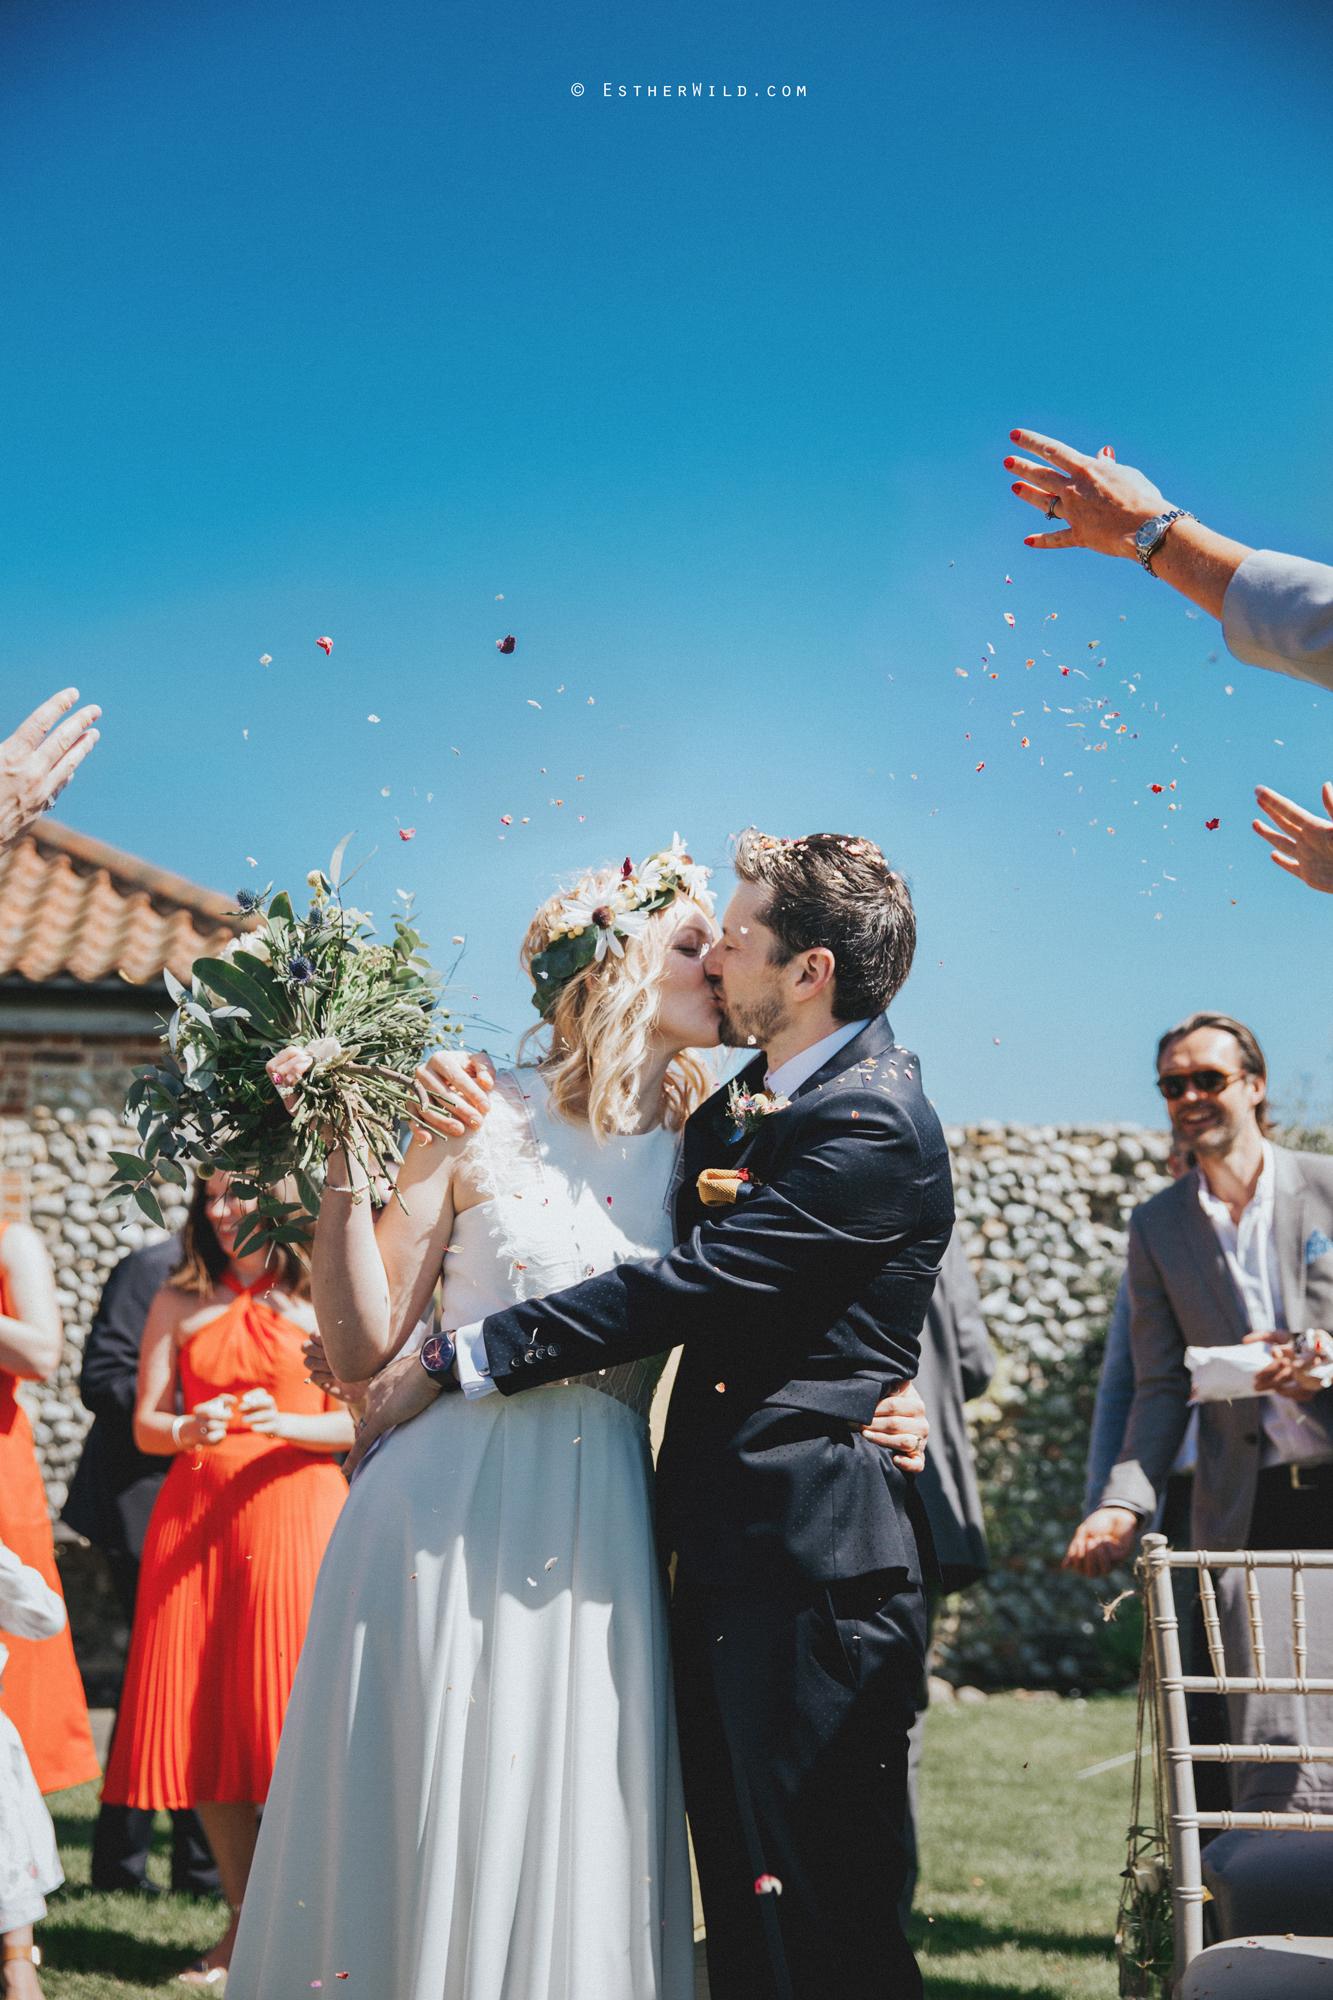 IMG_0814Cley_Barn_Drift_Norfolk_Coast_Wedding_Copyright_Esther_Wild_Photographer_.jpg